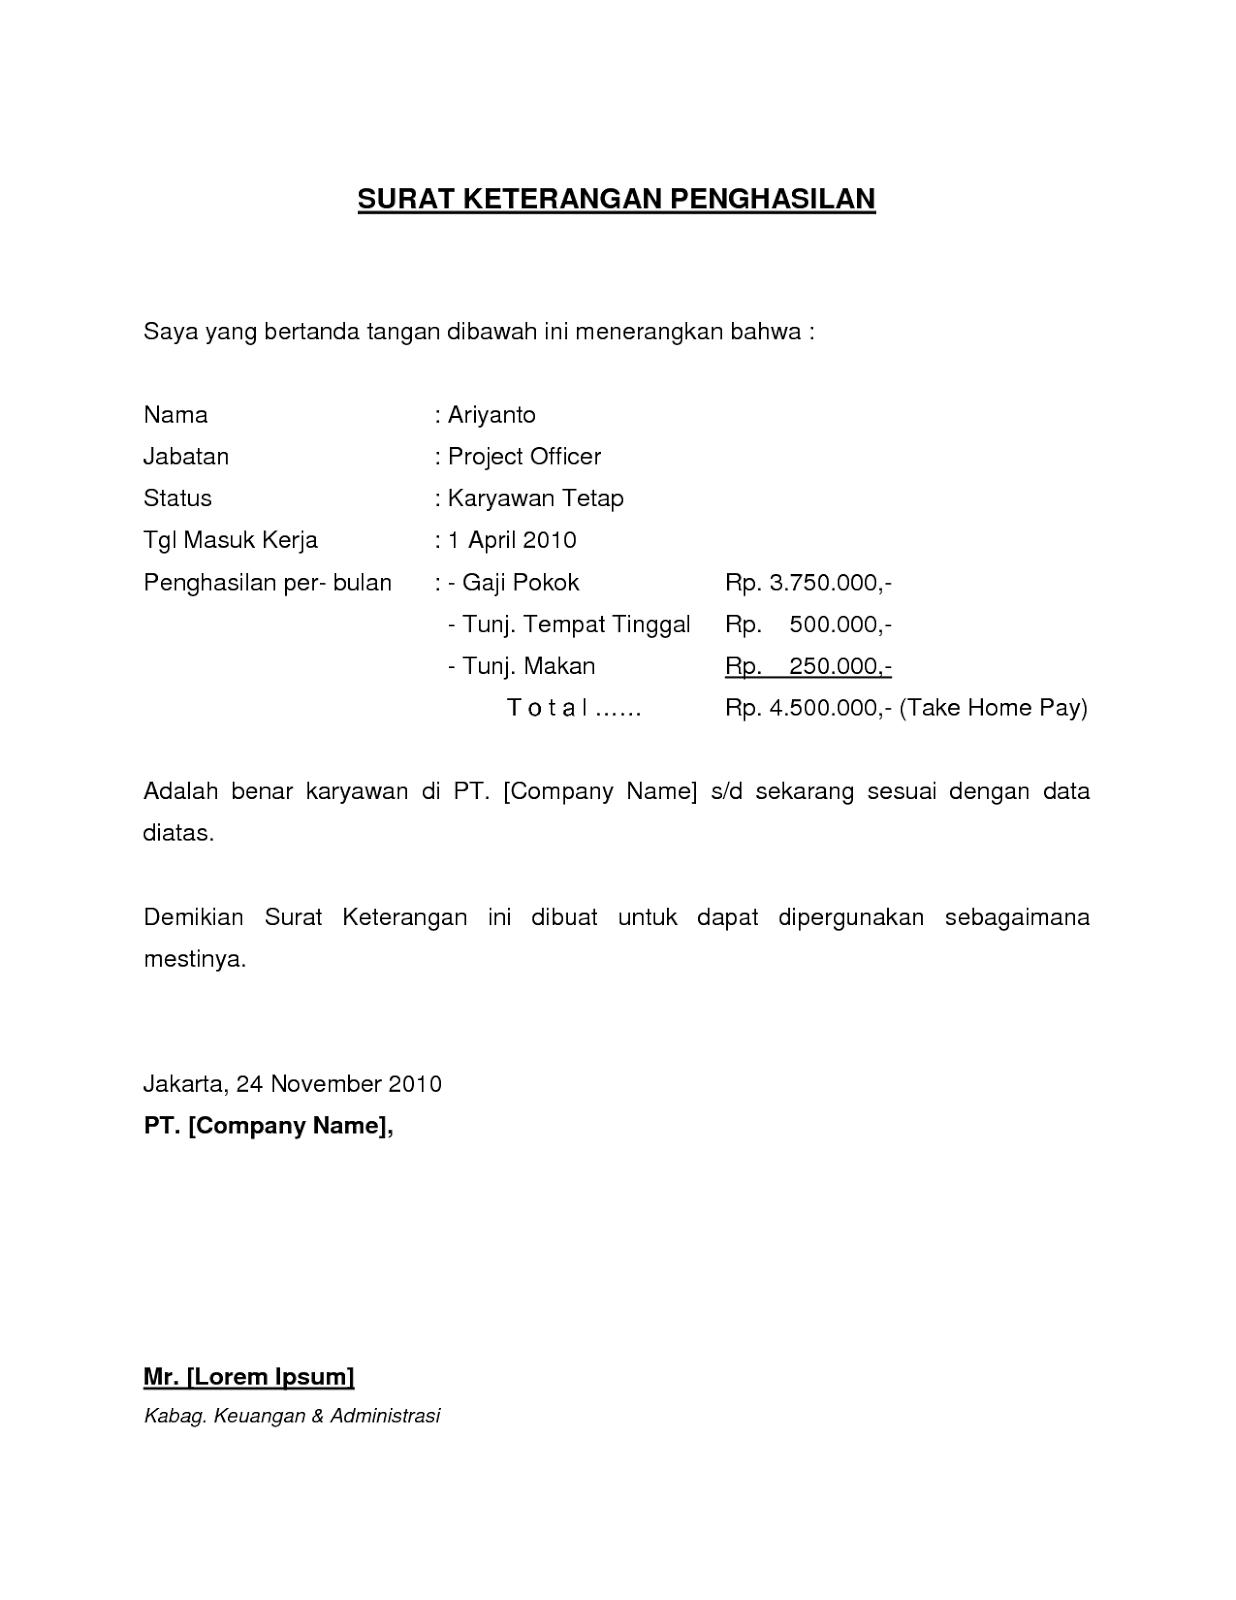 Contoh Surat Resign Yang Sederhana [[17]] - Contoh U